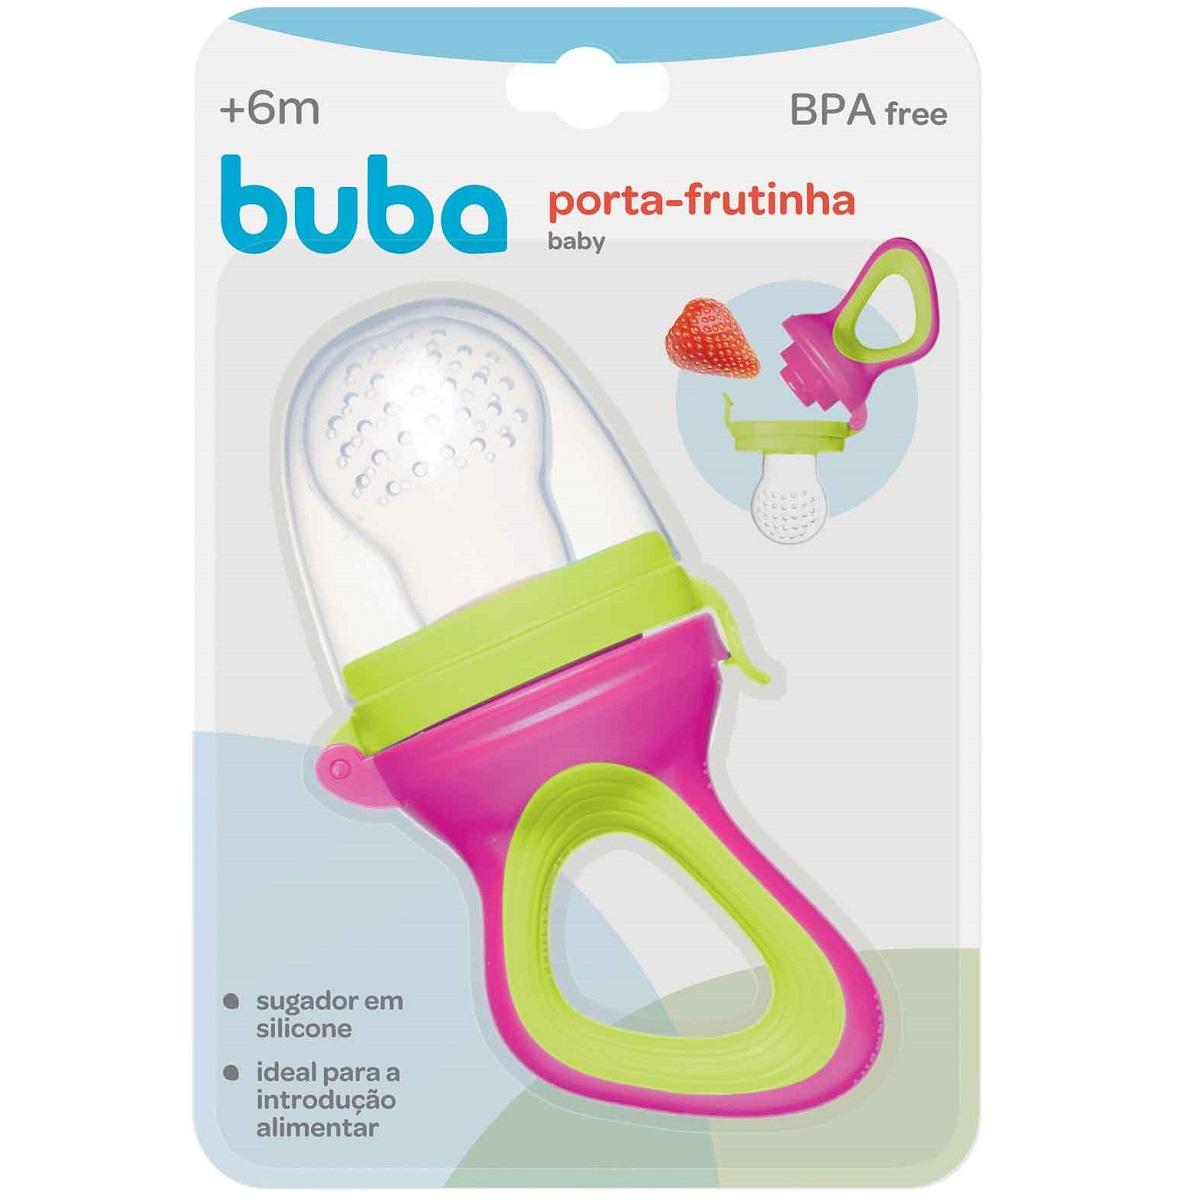 PORTA FRUTINHA BABY - BUBA 09743